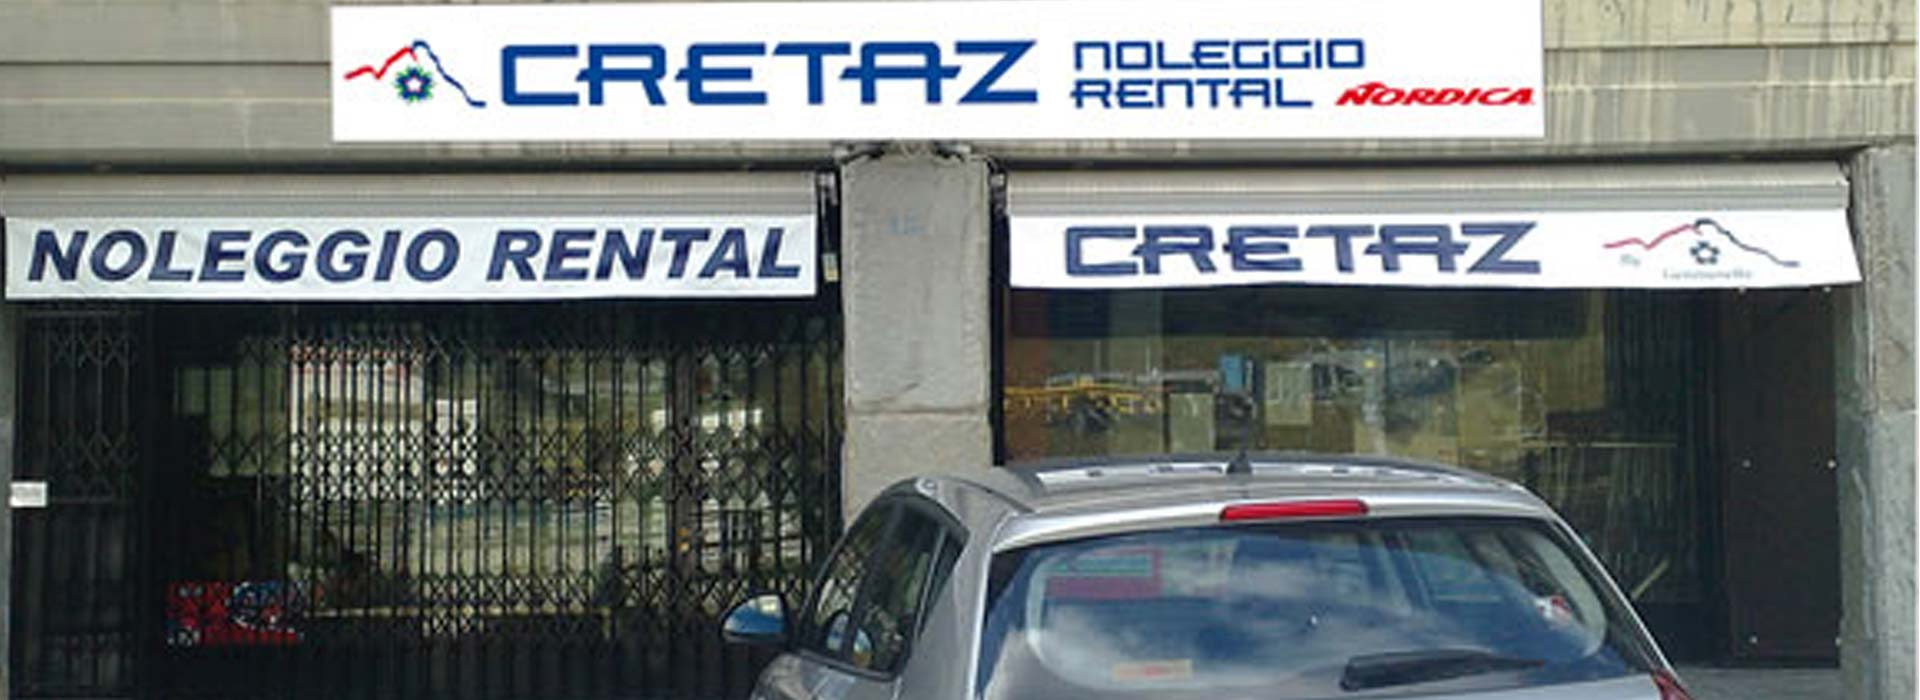 Cretaz Sport rental exterior